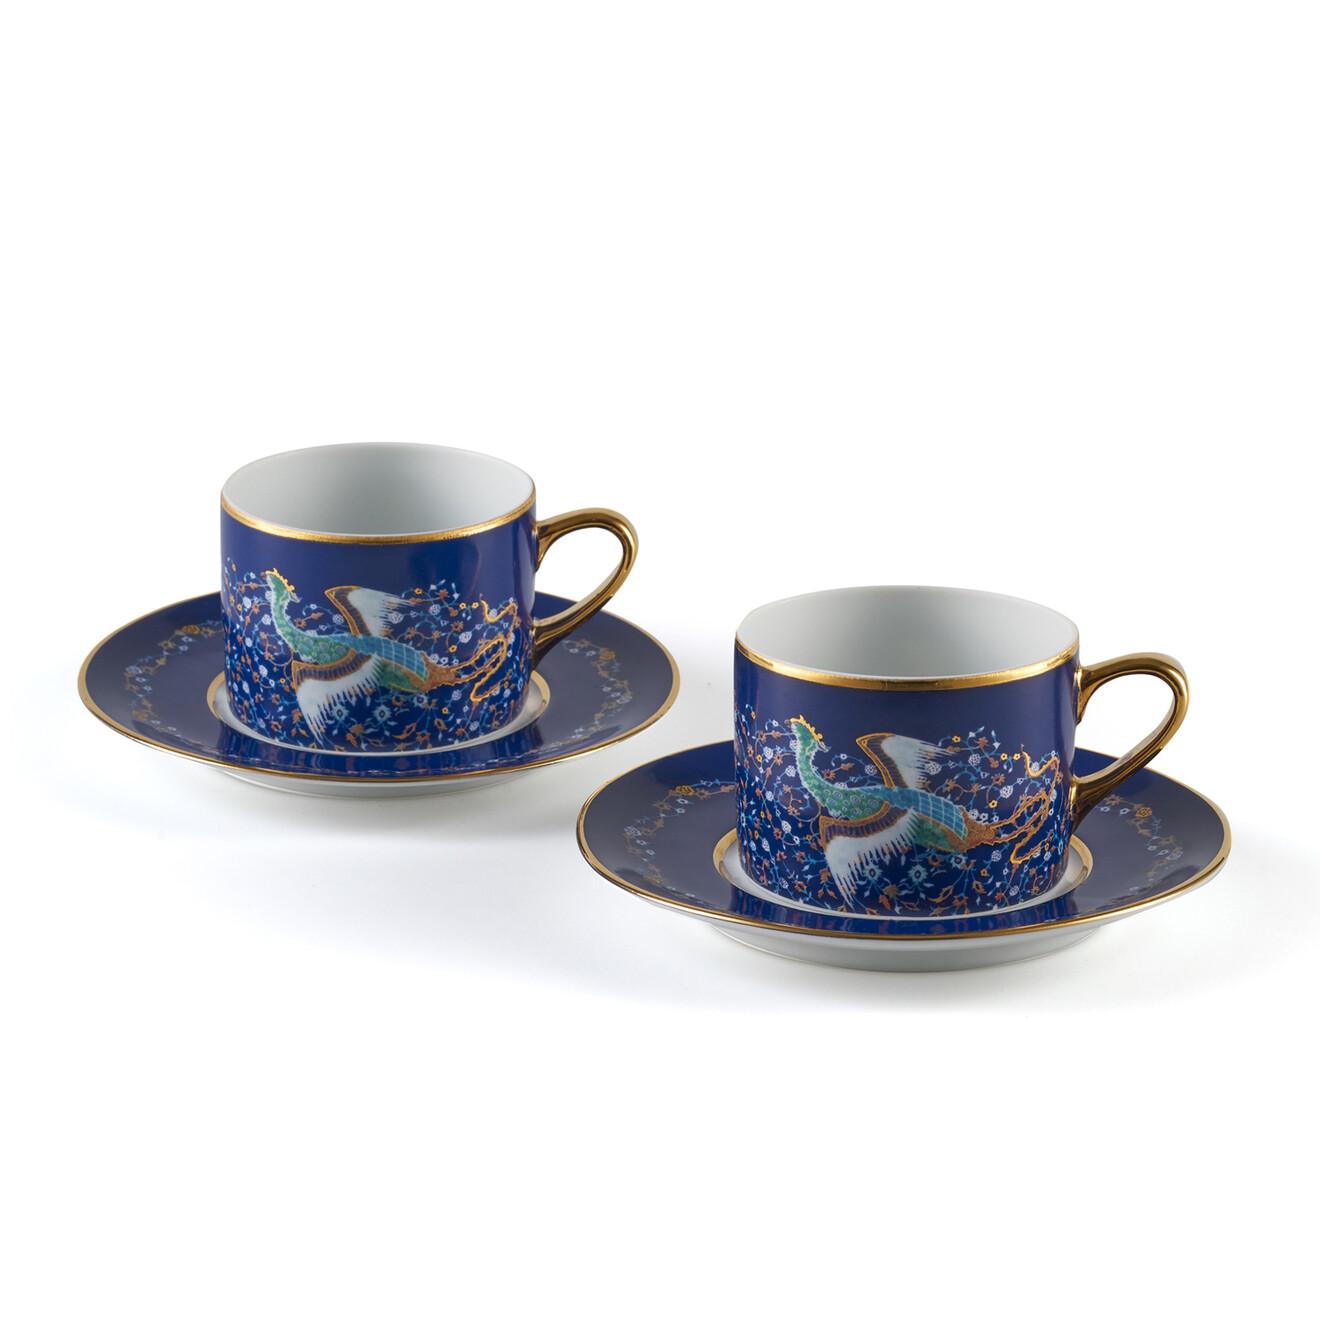 - Simurg Çay Fincanı 2'li Set